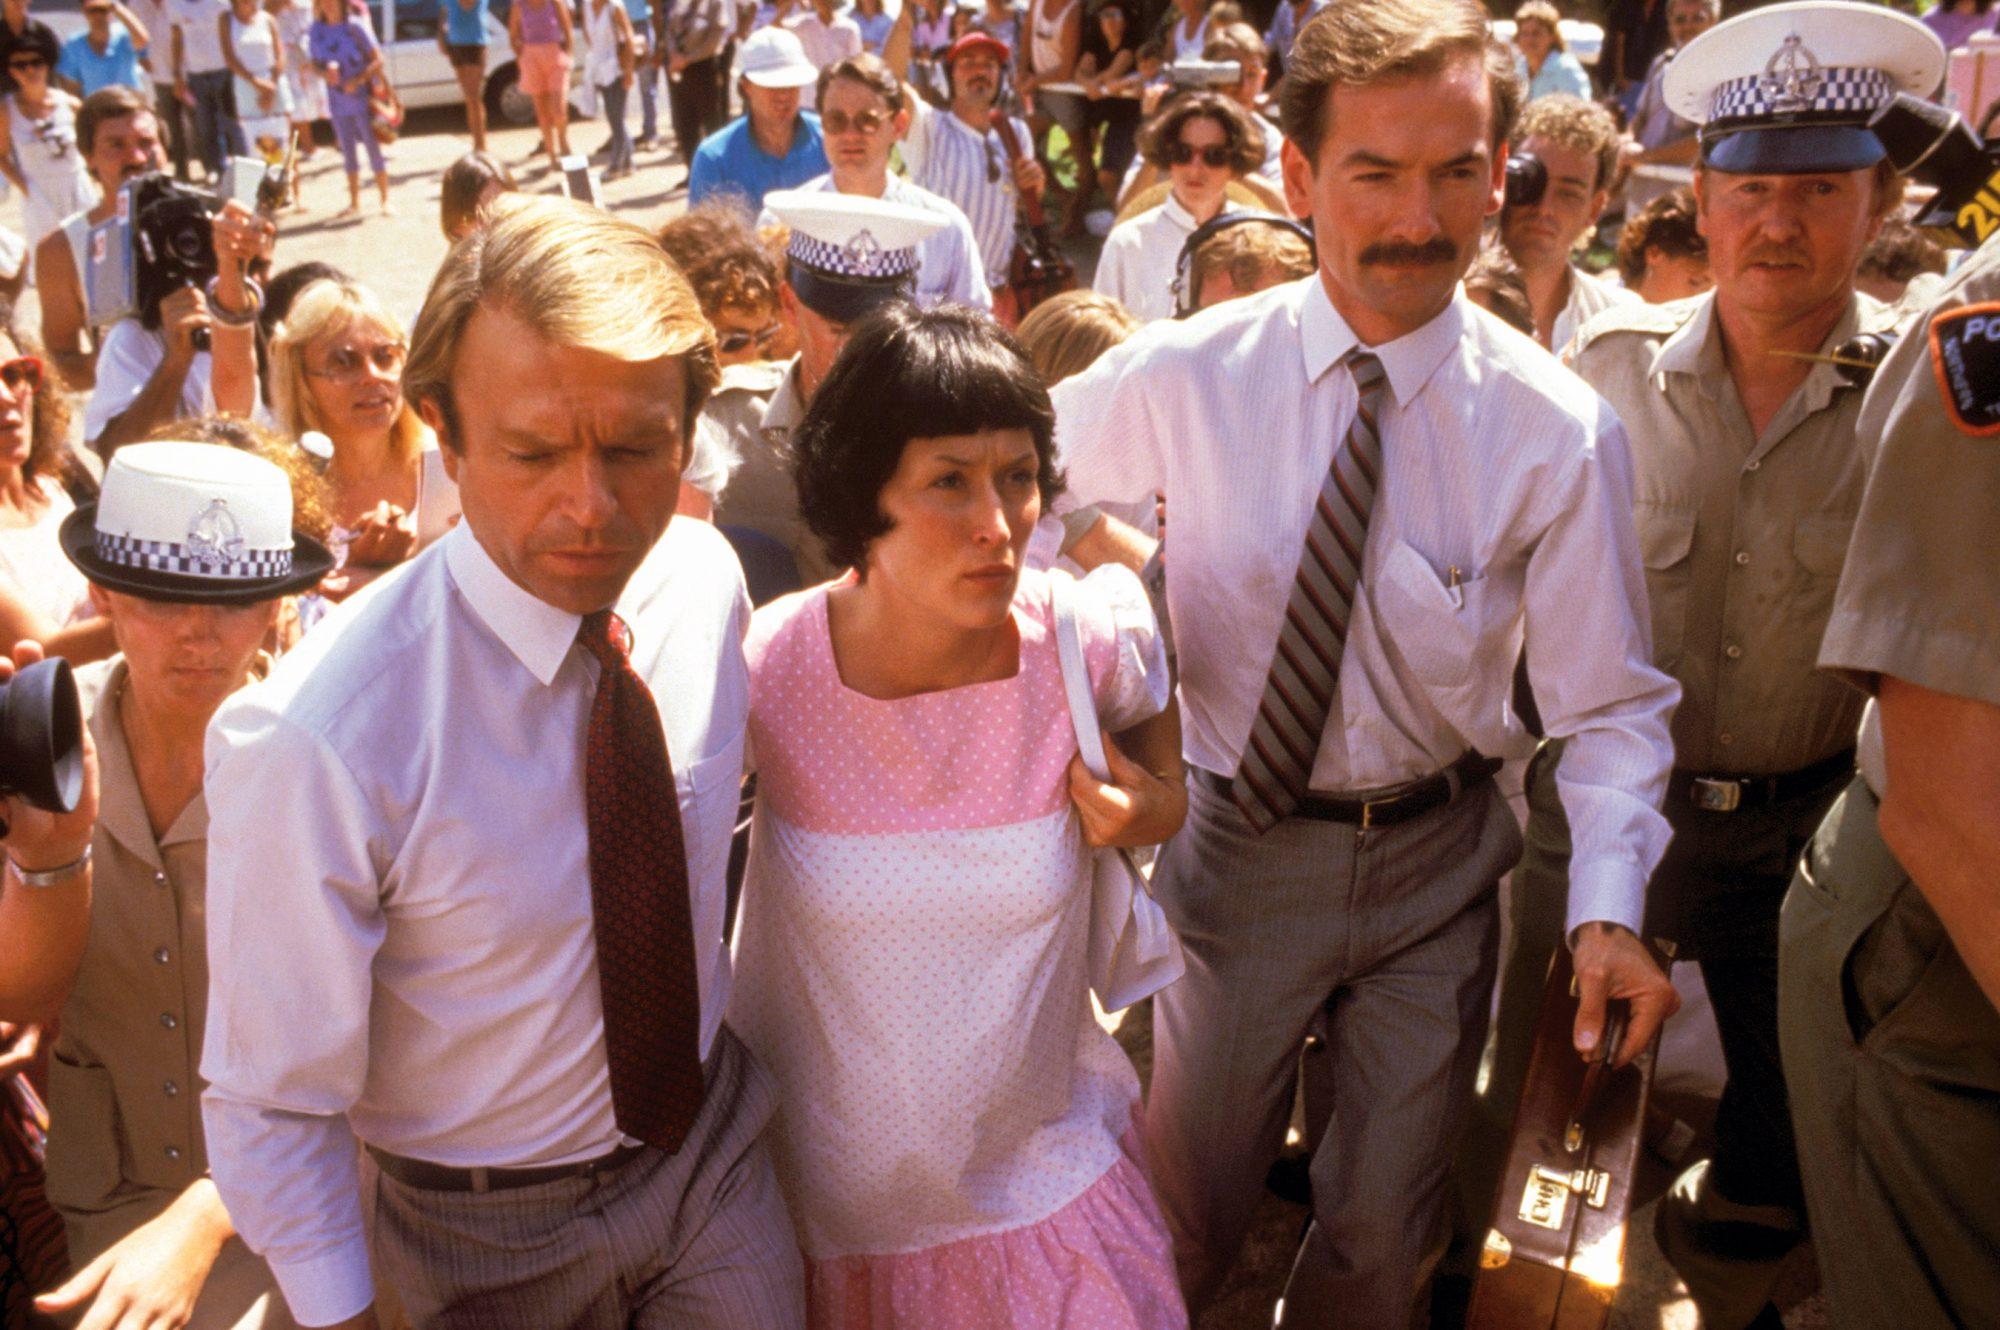 A CRY IN THE DARK, Sam Neill, Meryl Streep, 1988, (c) Warner Brothers/courtesy Everett Collection